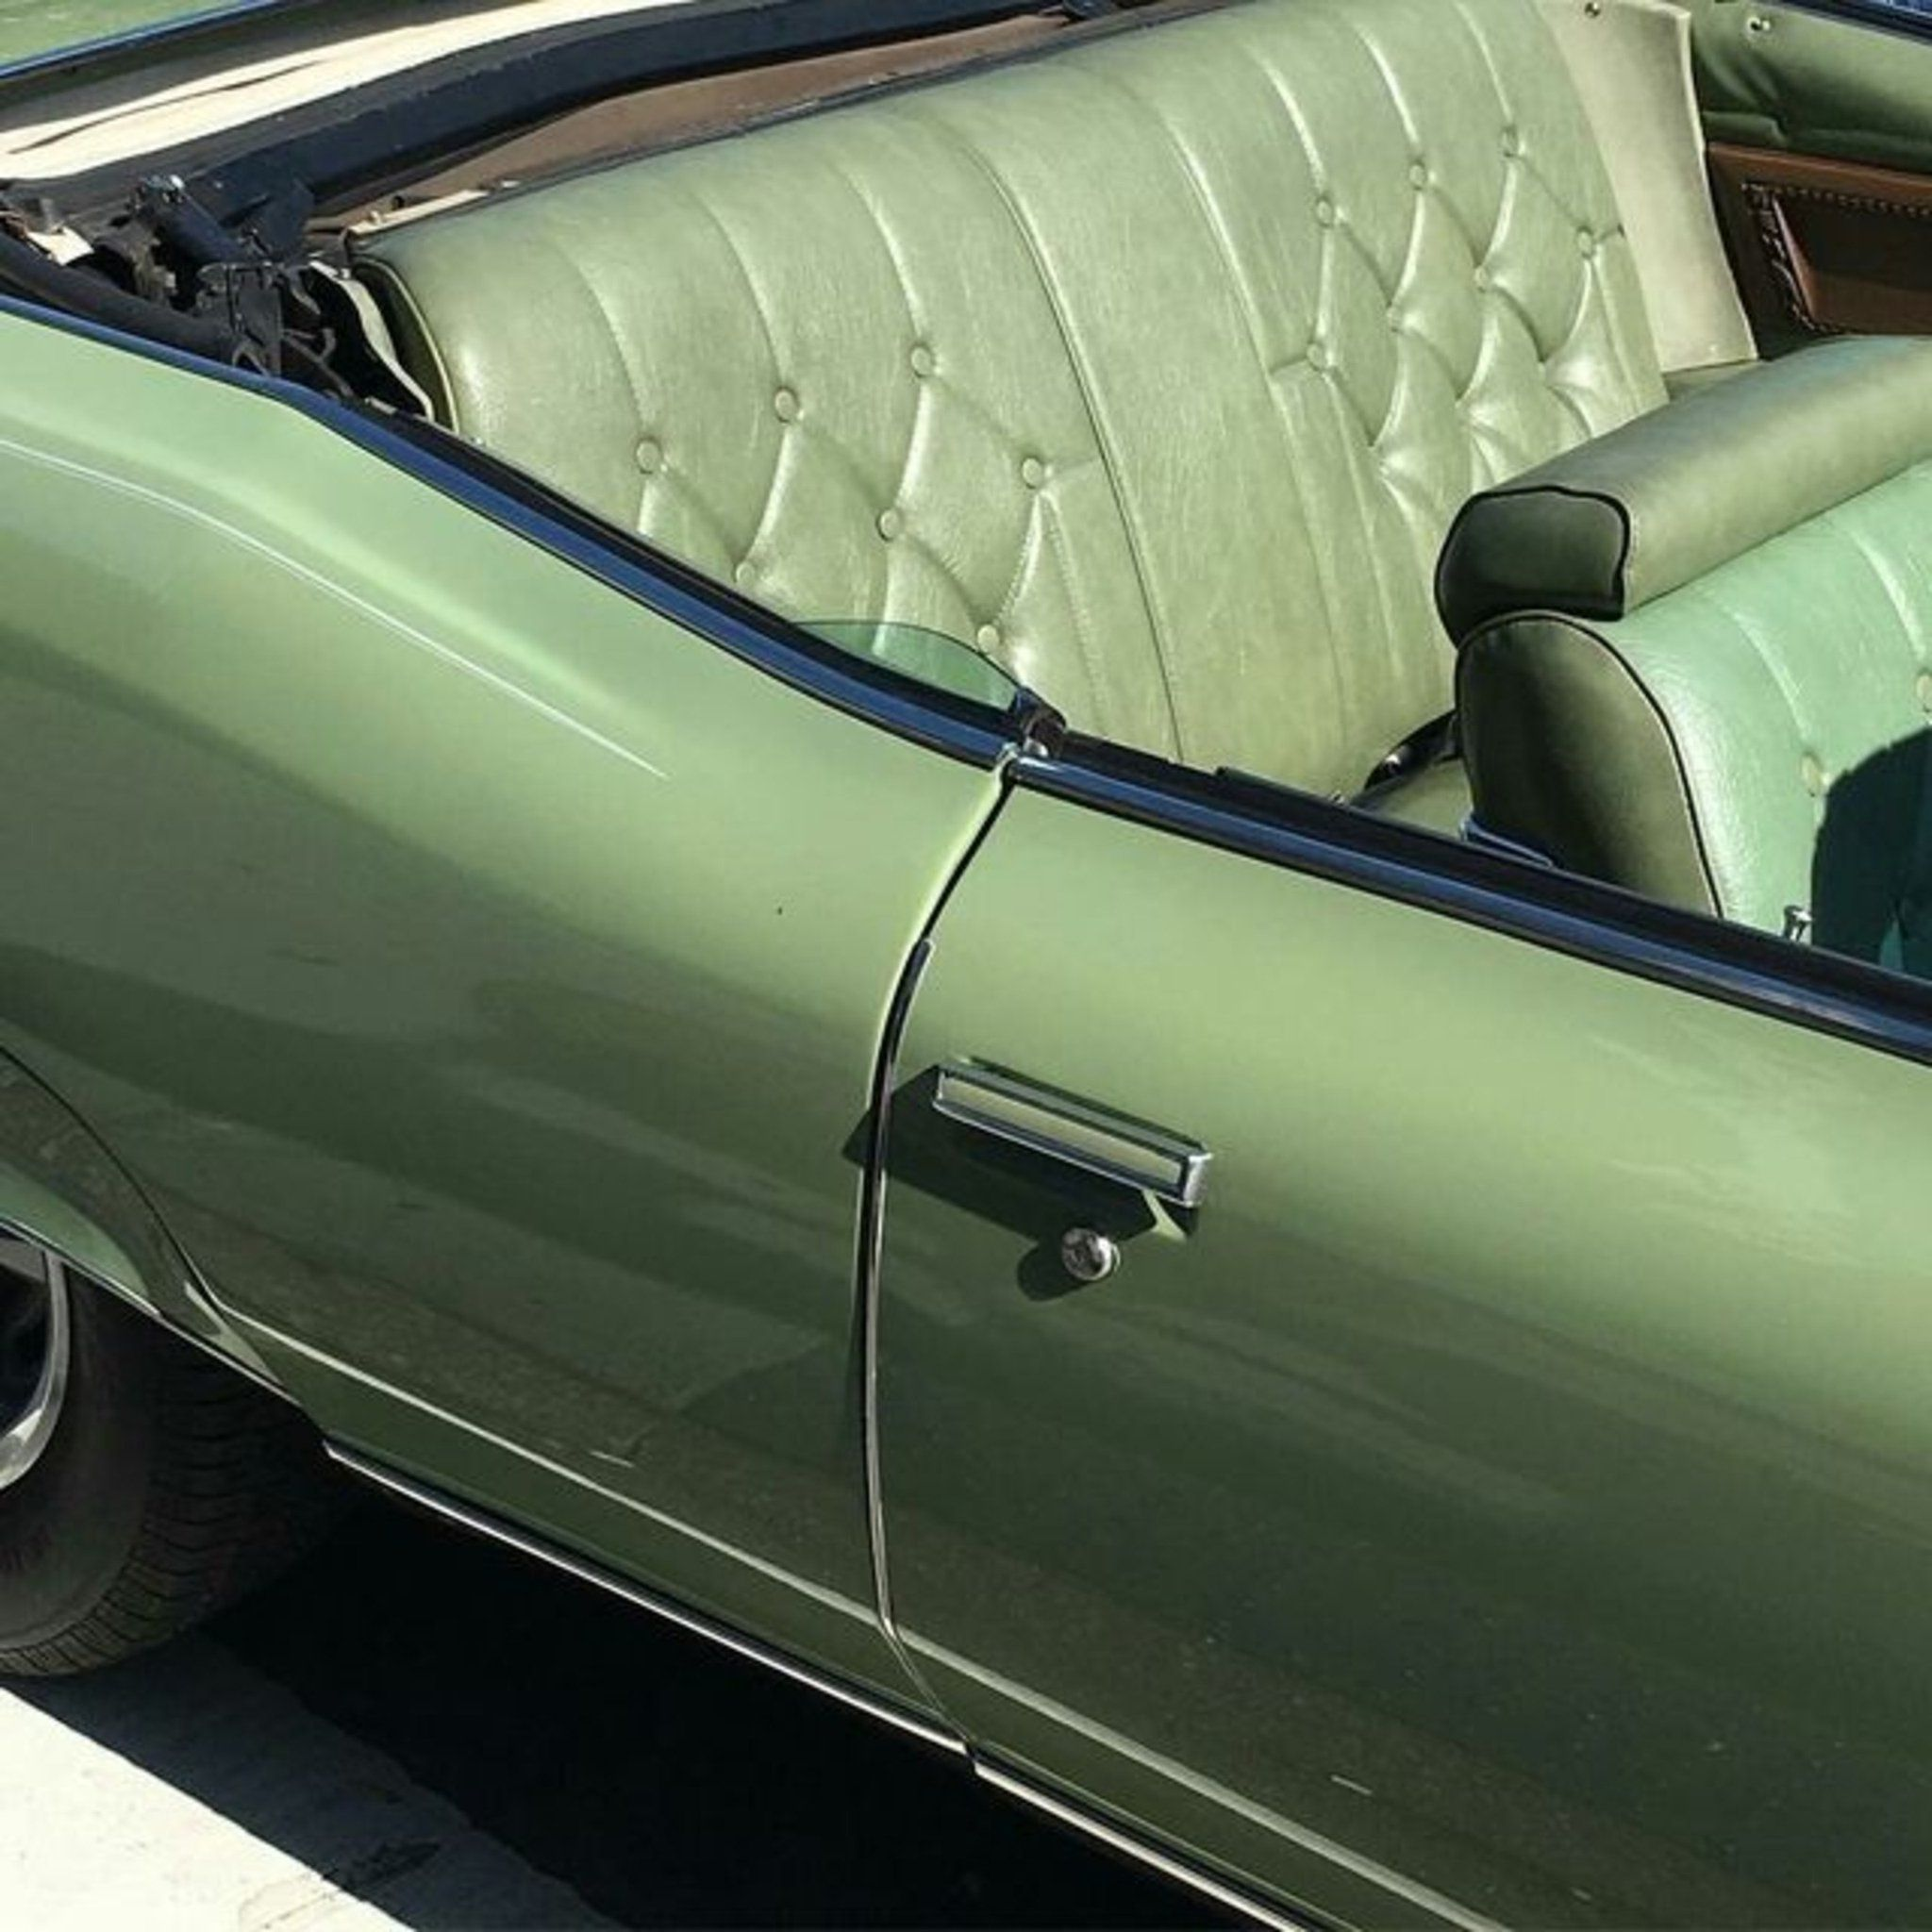 Green Vintage Car Interior